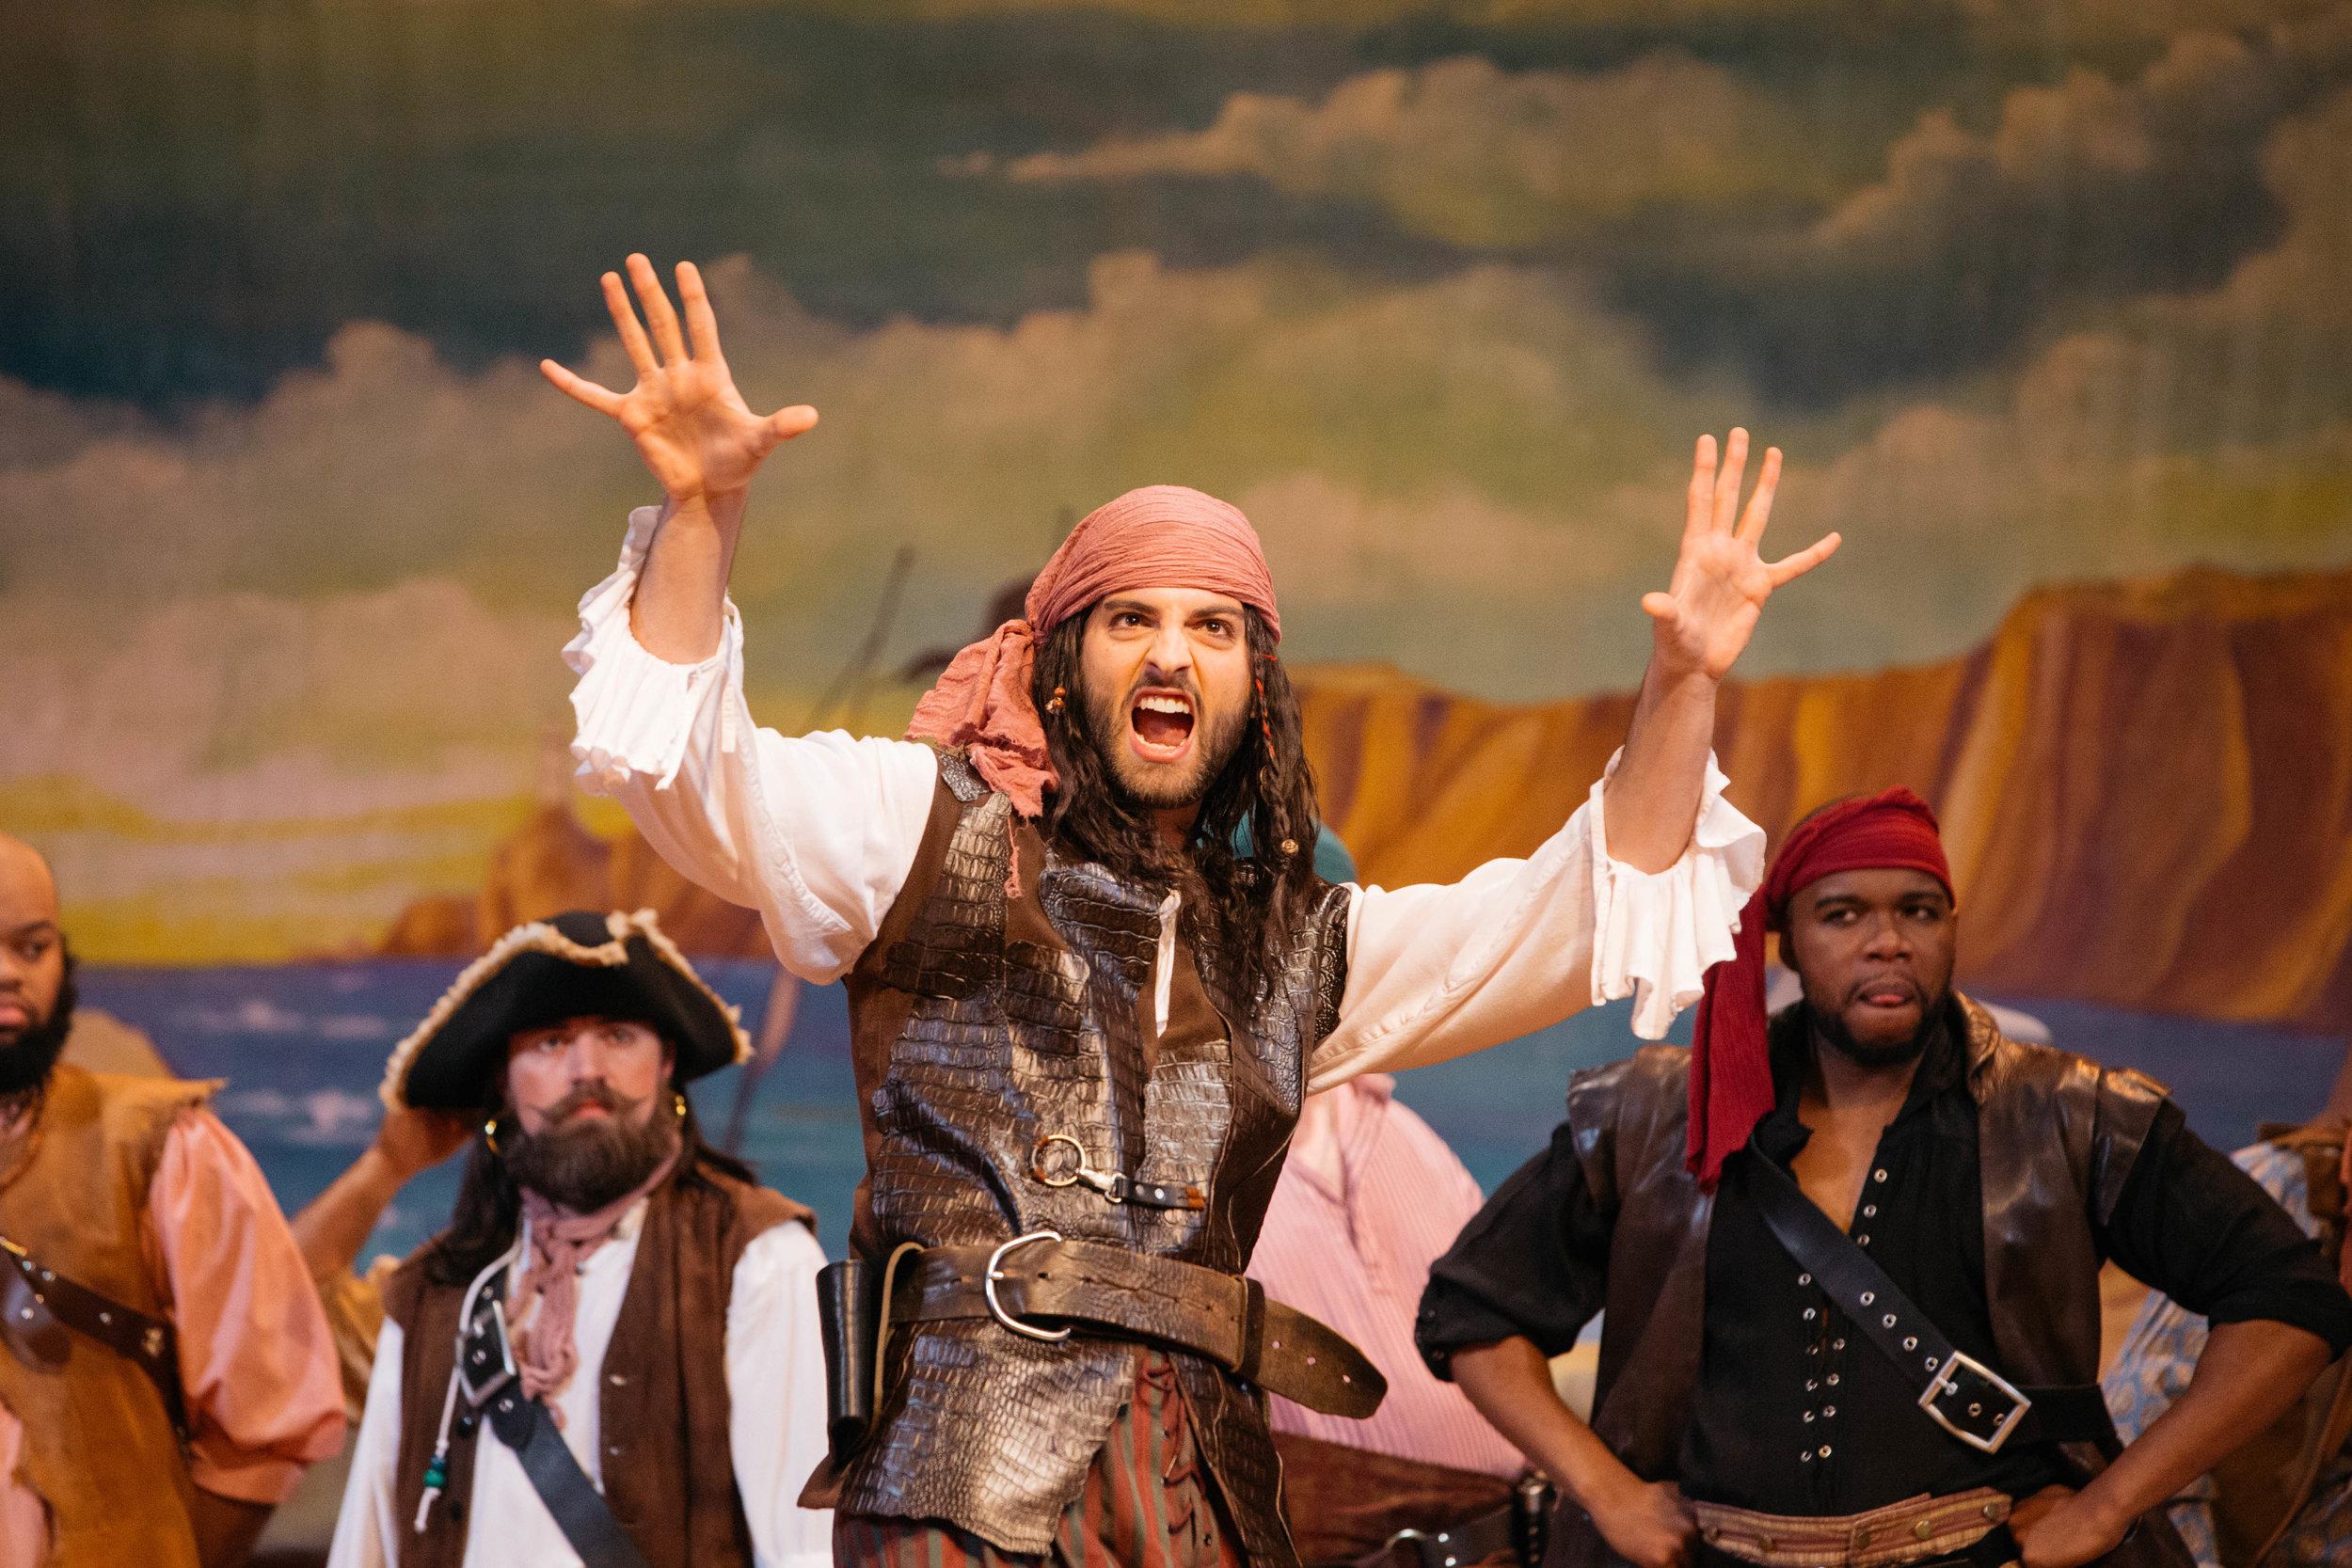 The Pirate King (photo by Ziggy Mack)